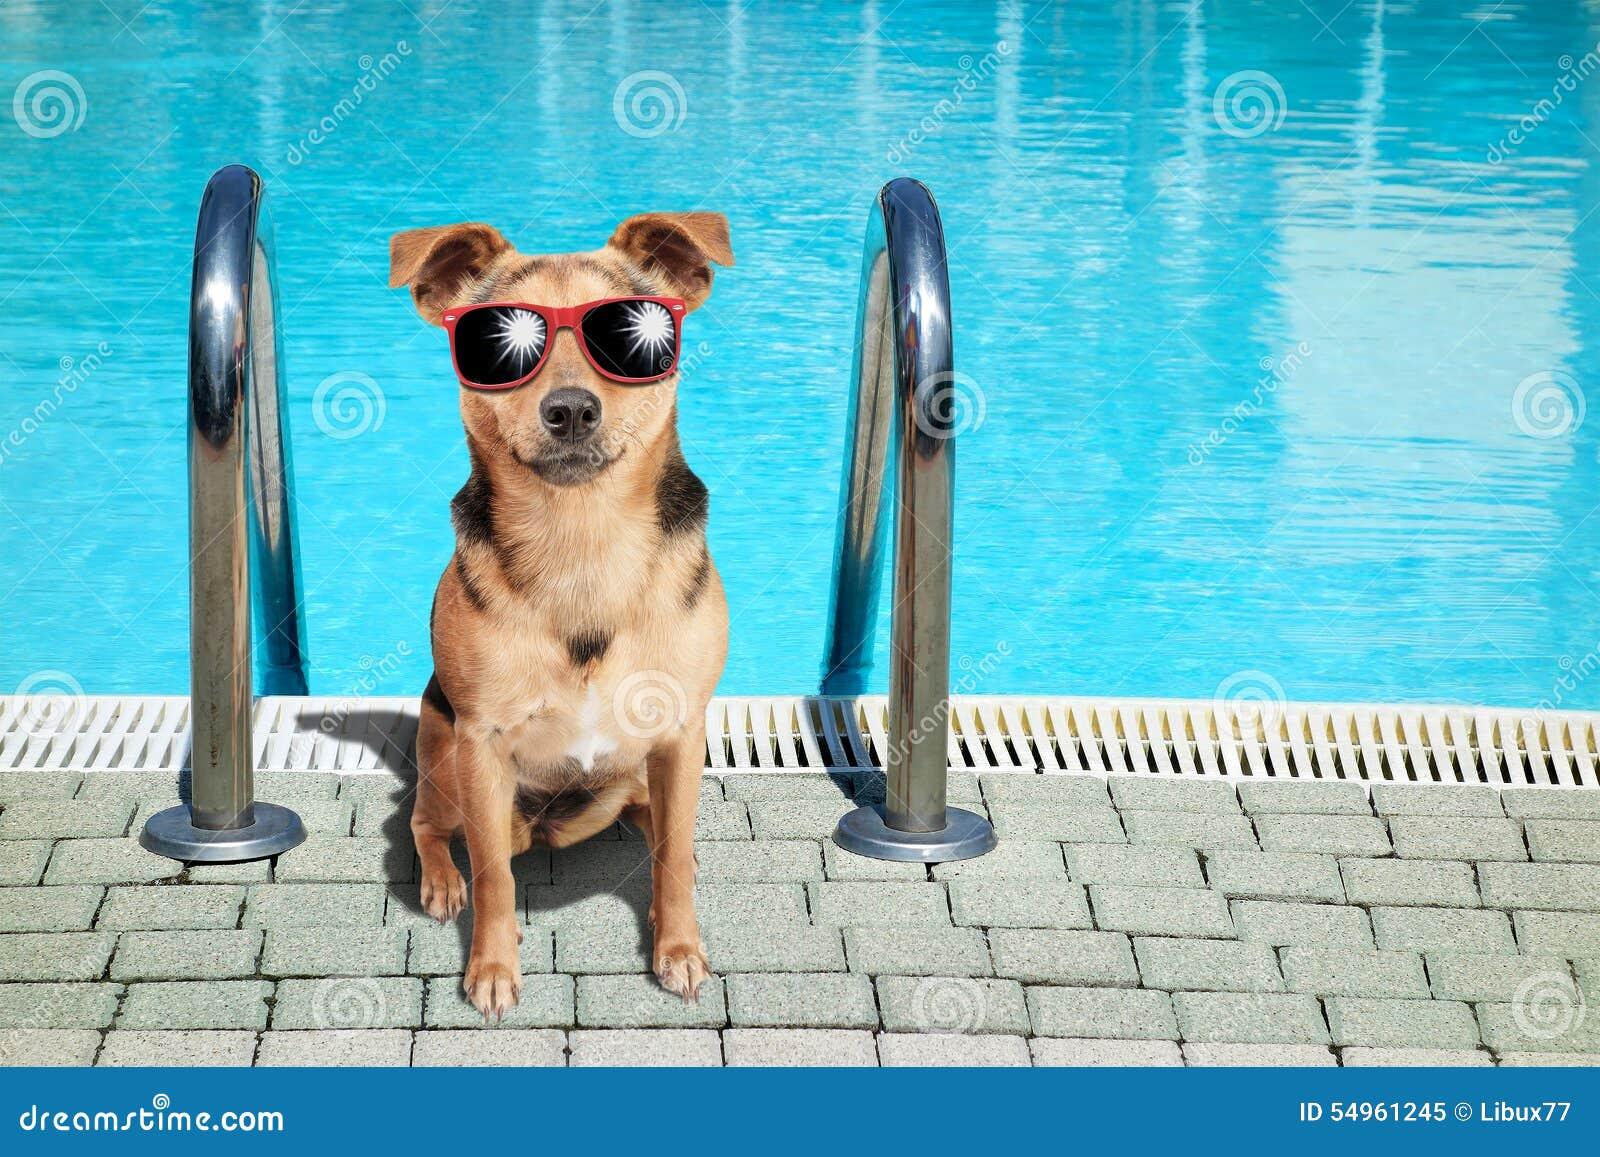 Dog Small Fawn Swimming Pool Sunglasses